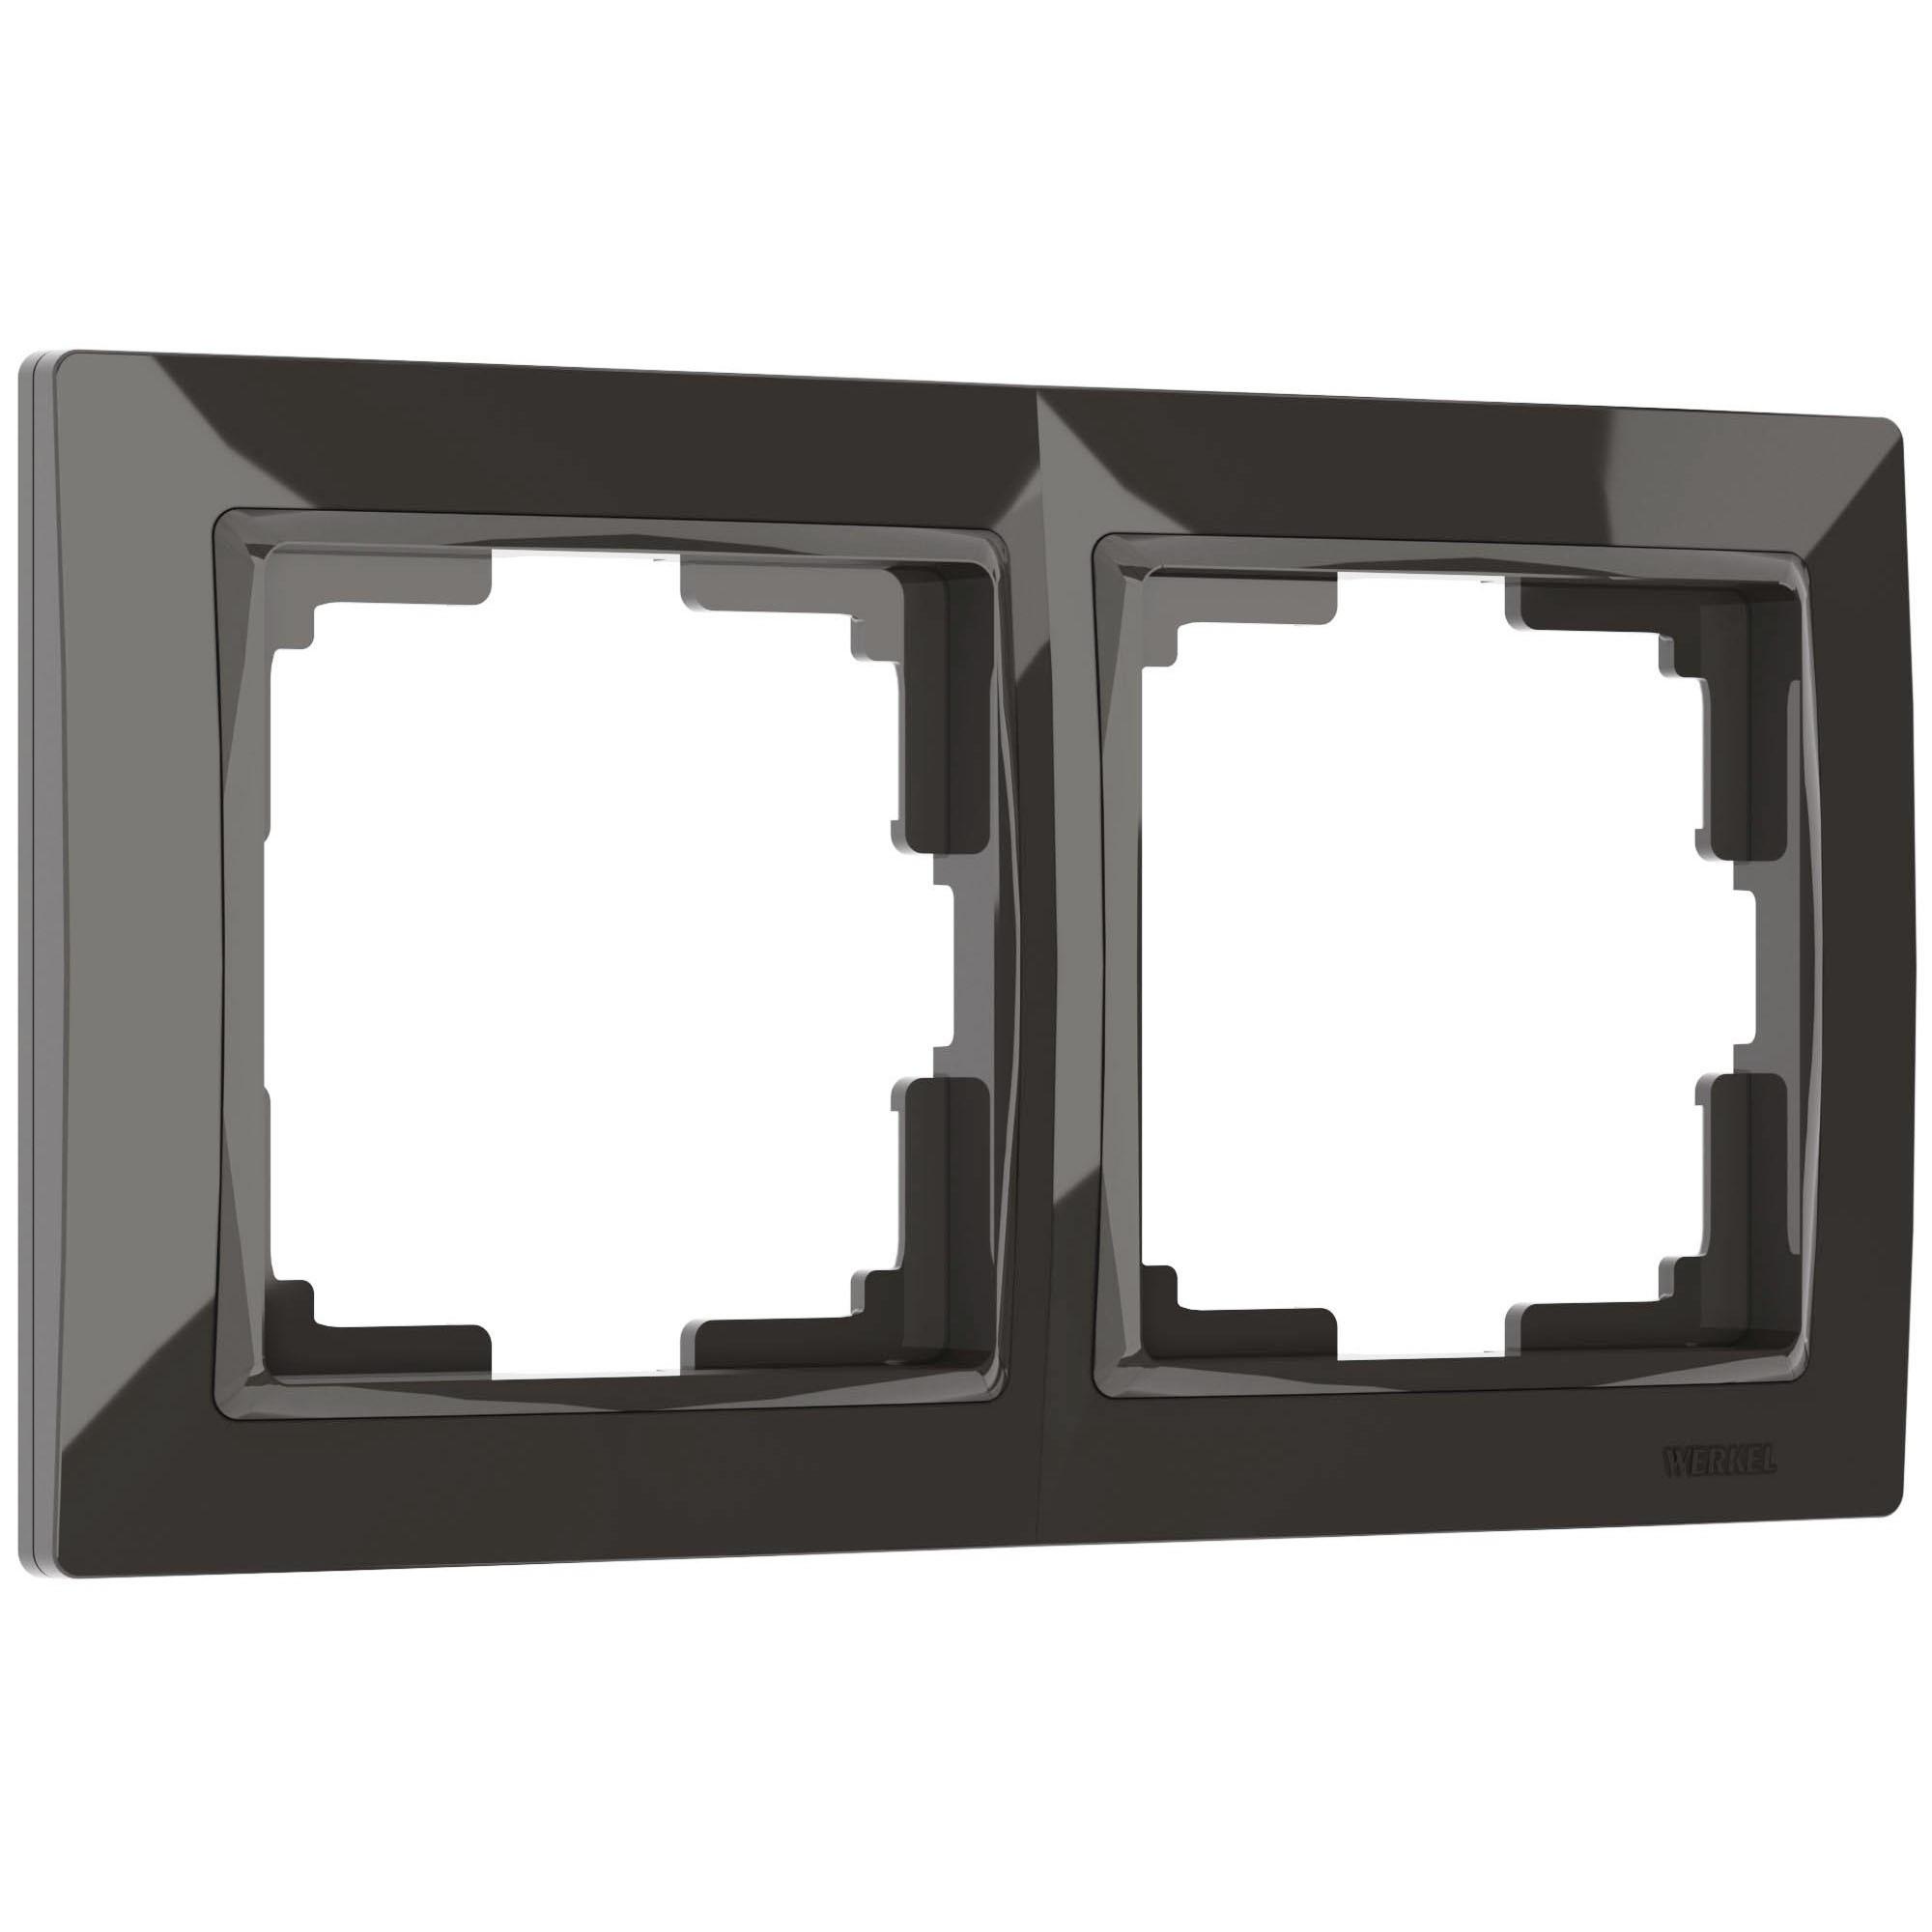 WL03-Frame-02/ Рамка на 2 поста (серо-коричневый, basic)